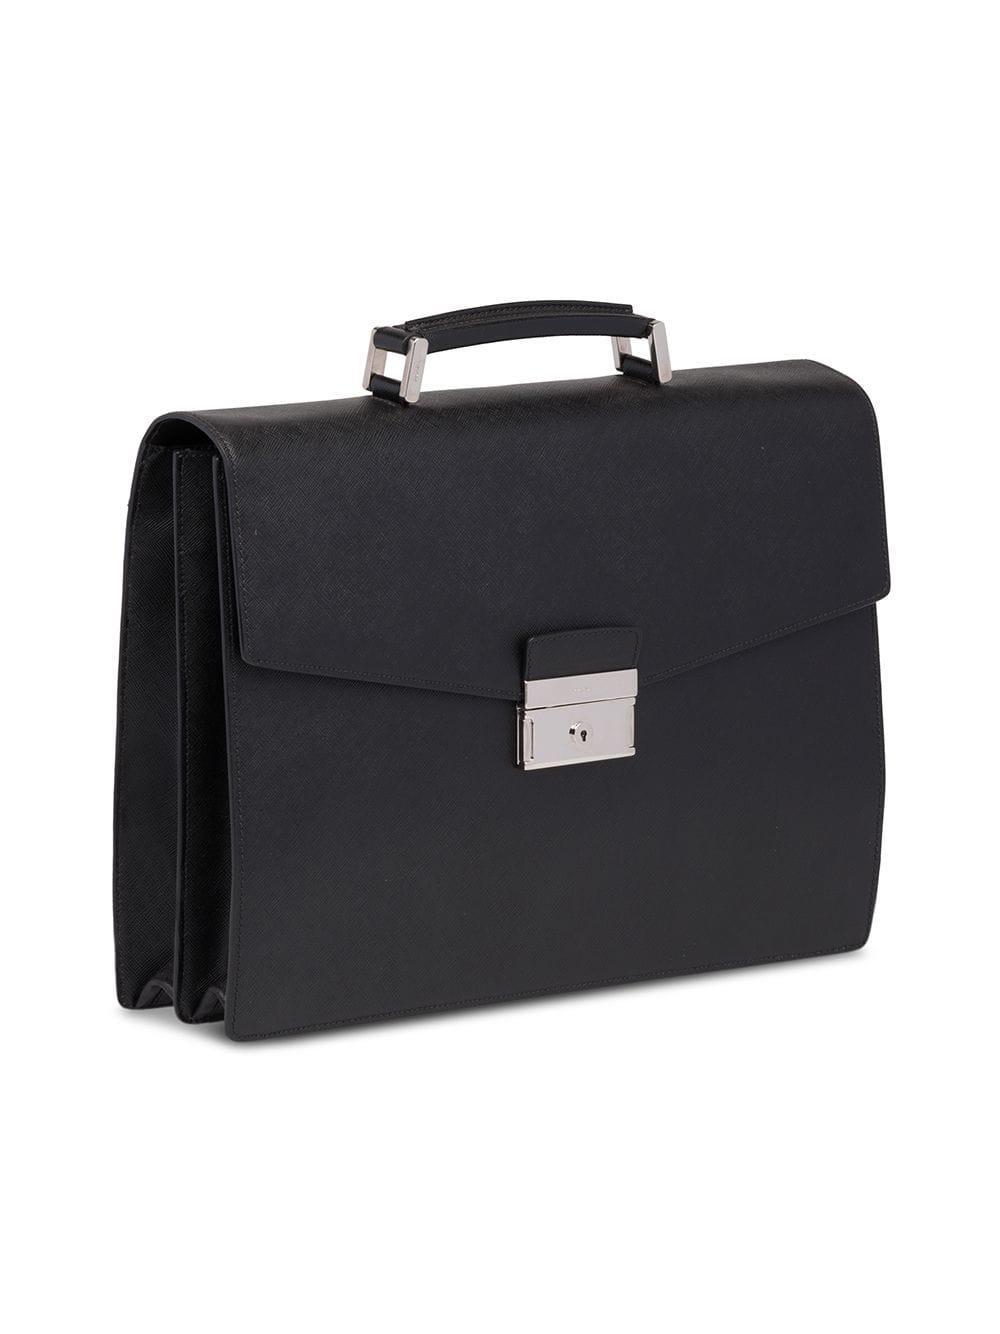 0b399a108845 Prada Saffiano Leather Briefcase in Black for Men - Lyst